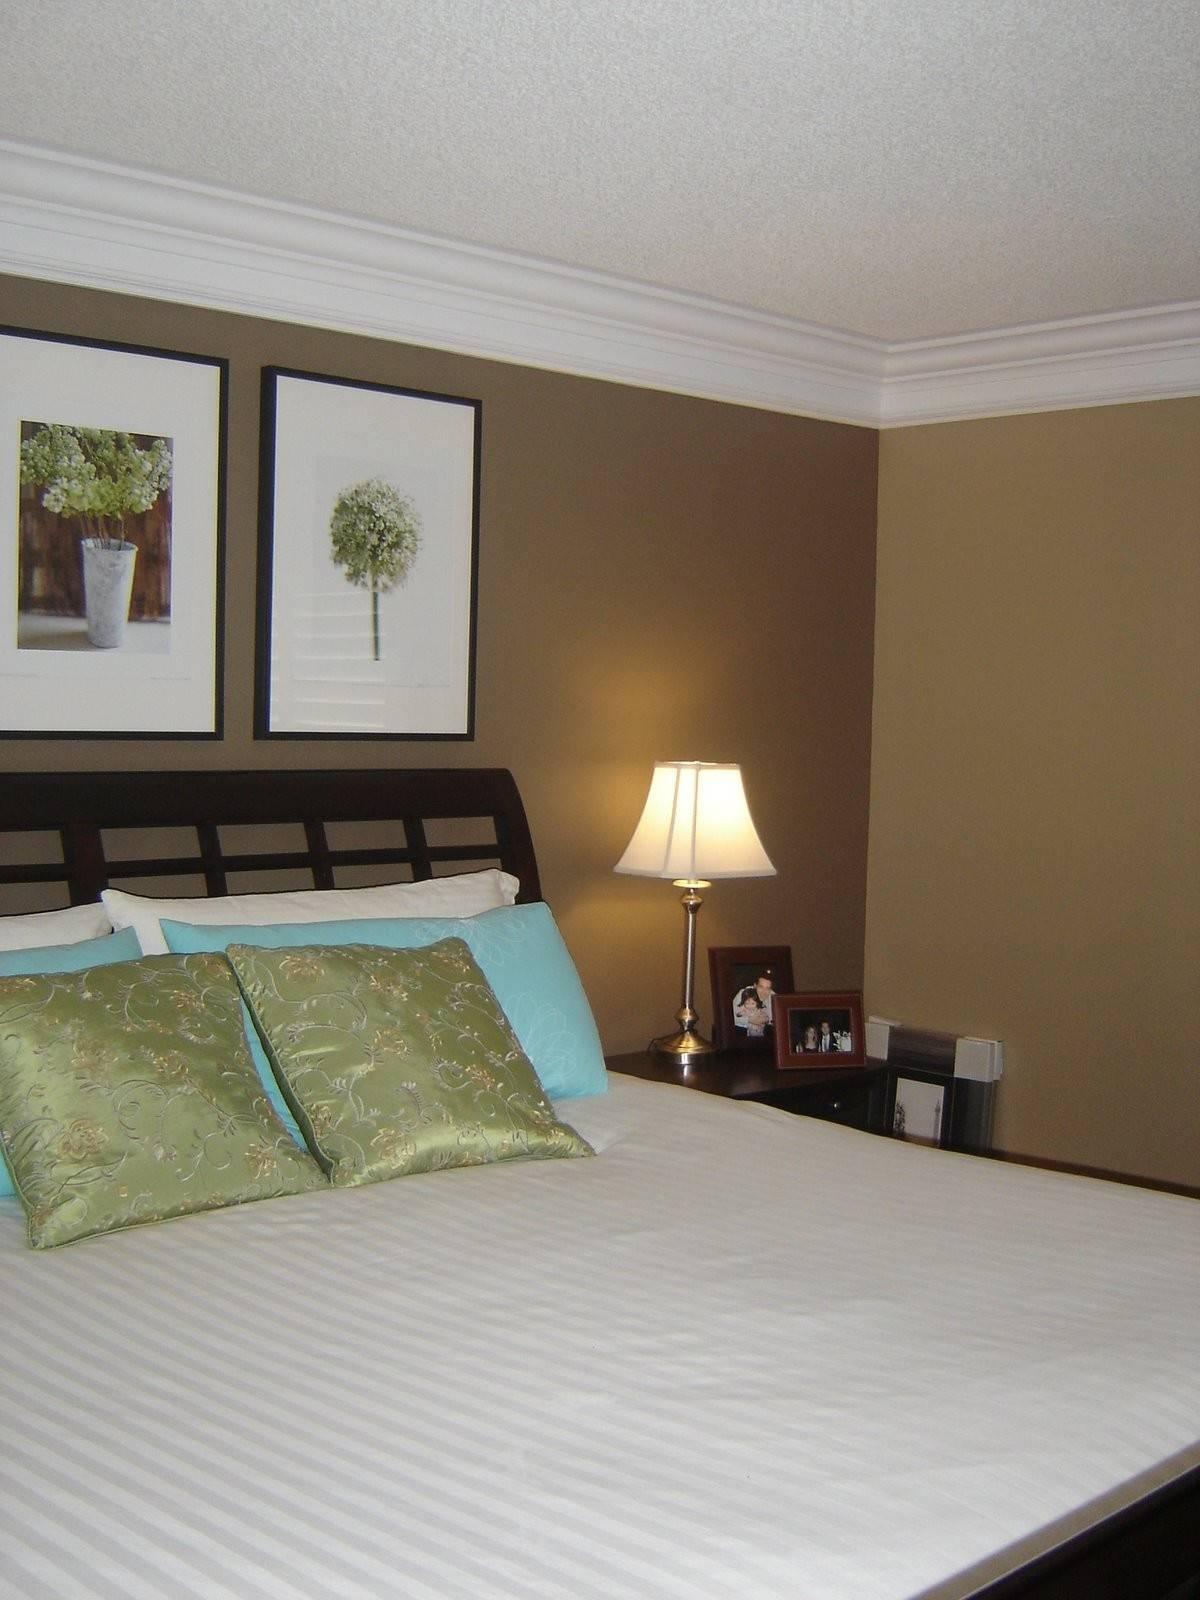 Classy Marvelous Bedroom Wall Design Ideas